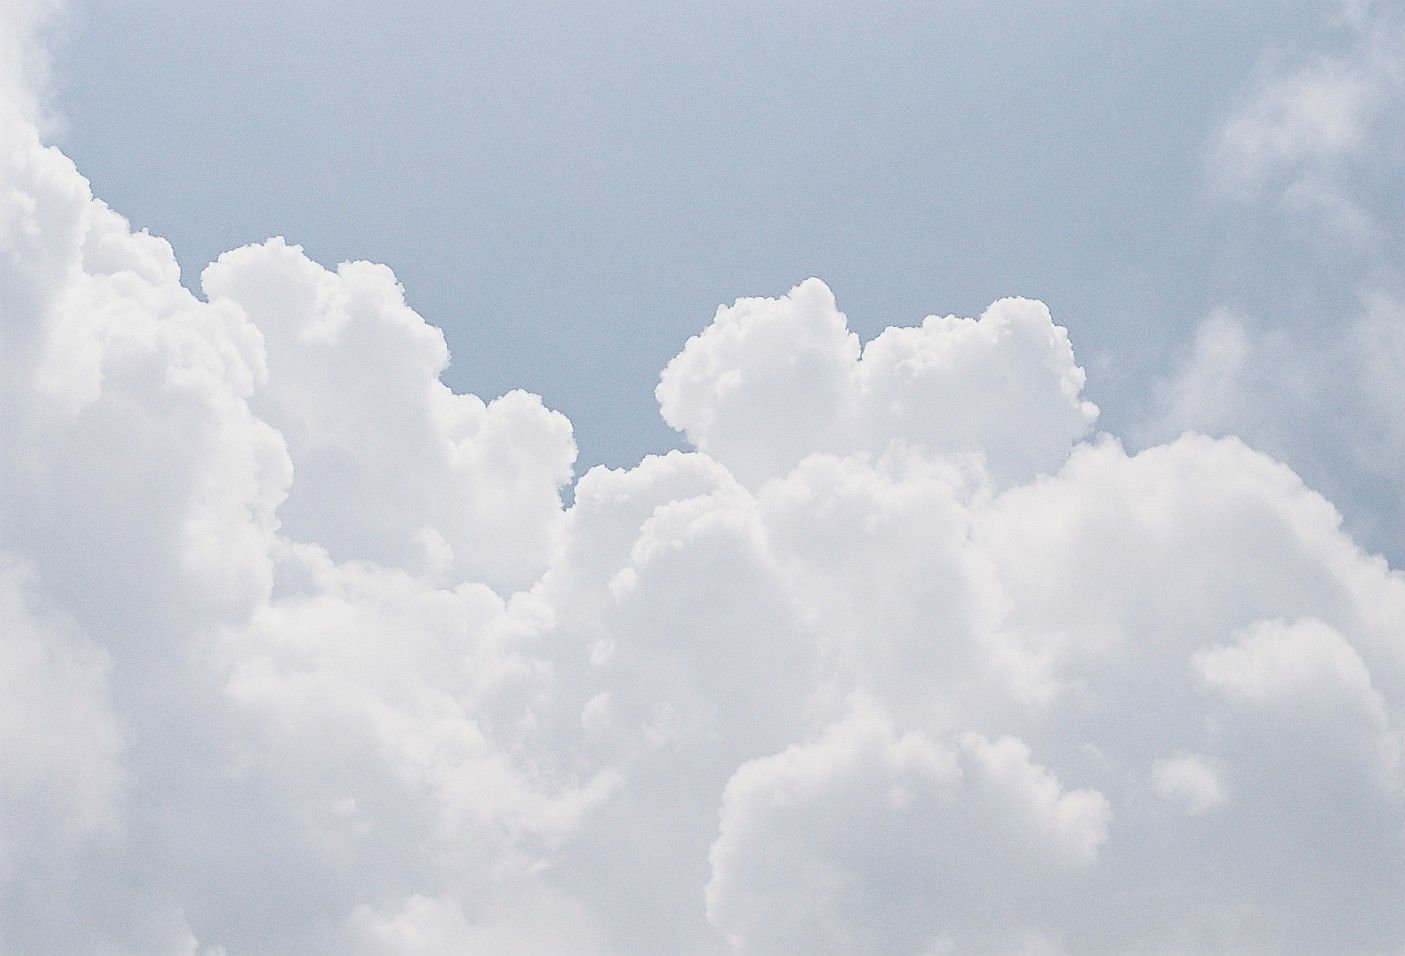 Early Summer Cloud Sky Aesthetic Light Blue Aesthetic Clouds Aesthetic clouds desktop wallpaper hd